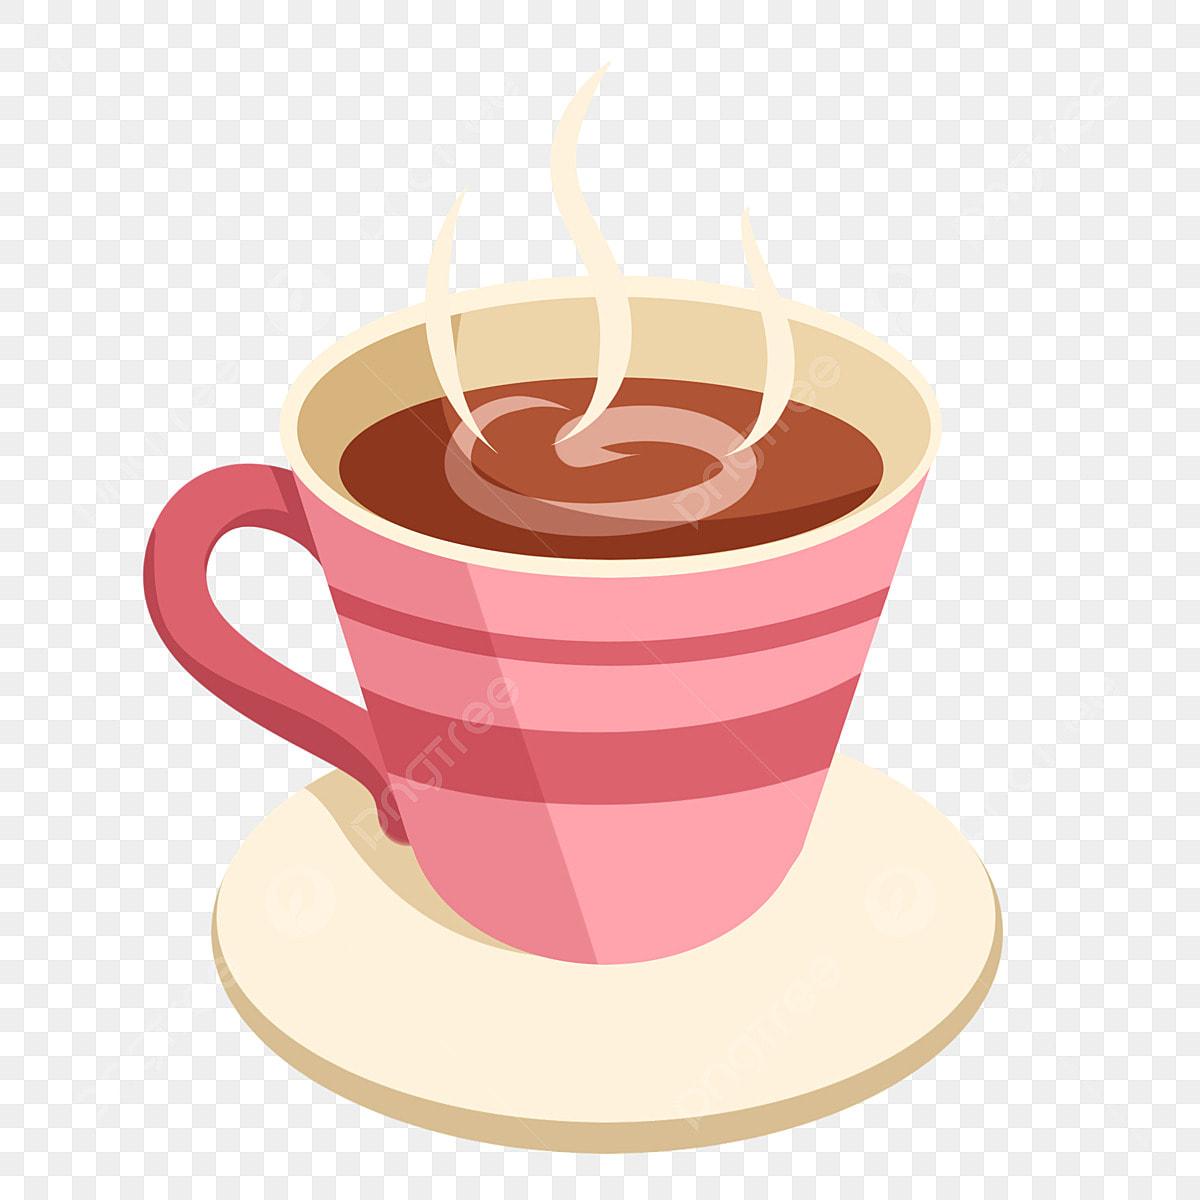 Coffee cup illustration. Drink pink macchiato hand